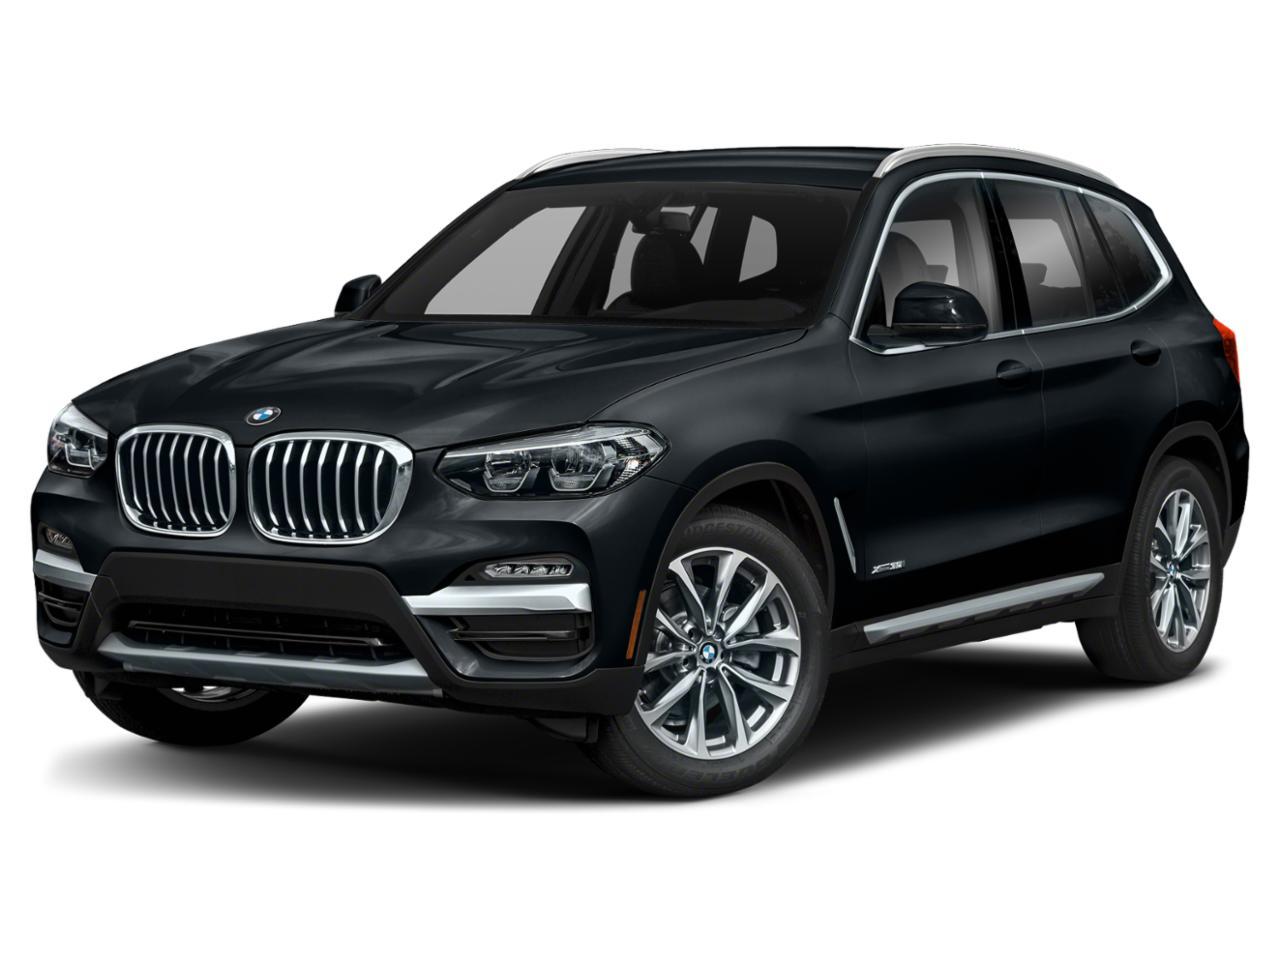 2020 BMW X3 xDrive30i Vehicle Photo in SMYRNA, GA 30080-7631